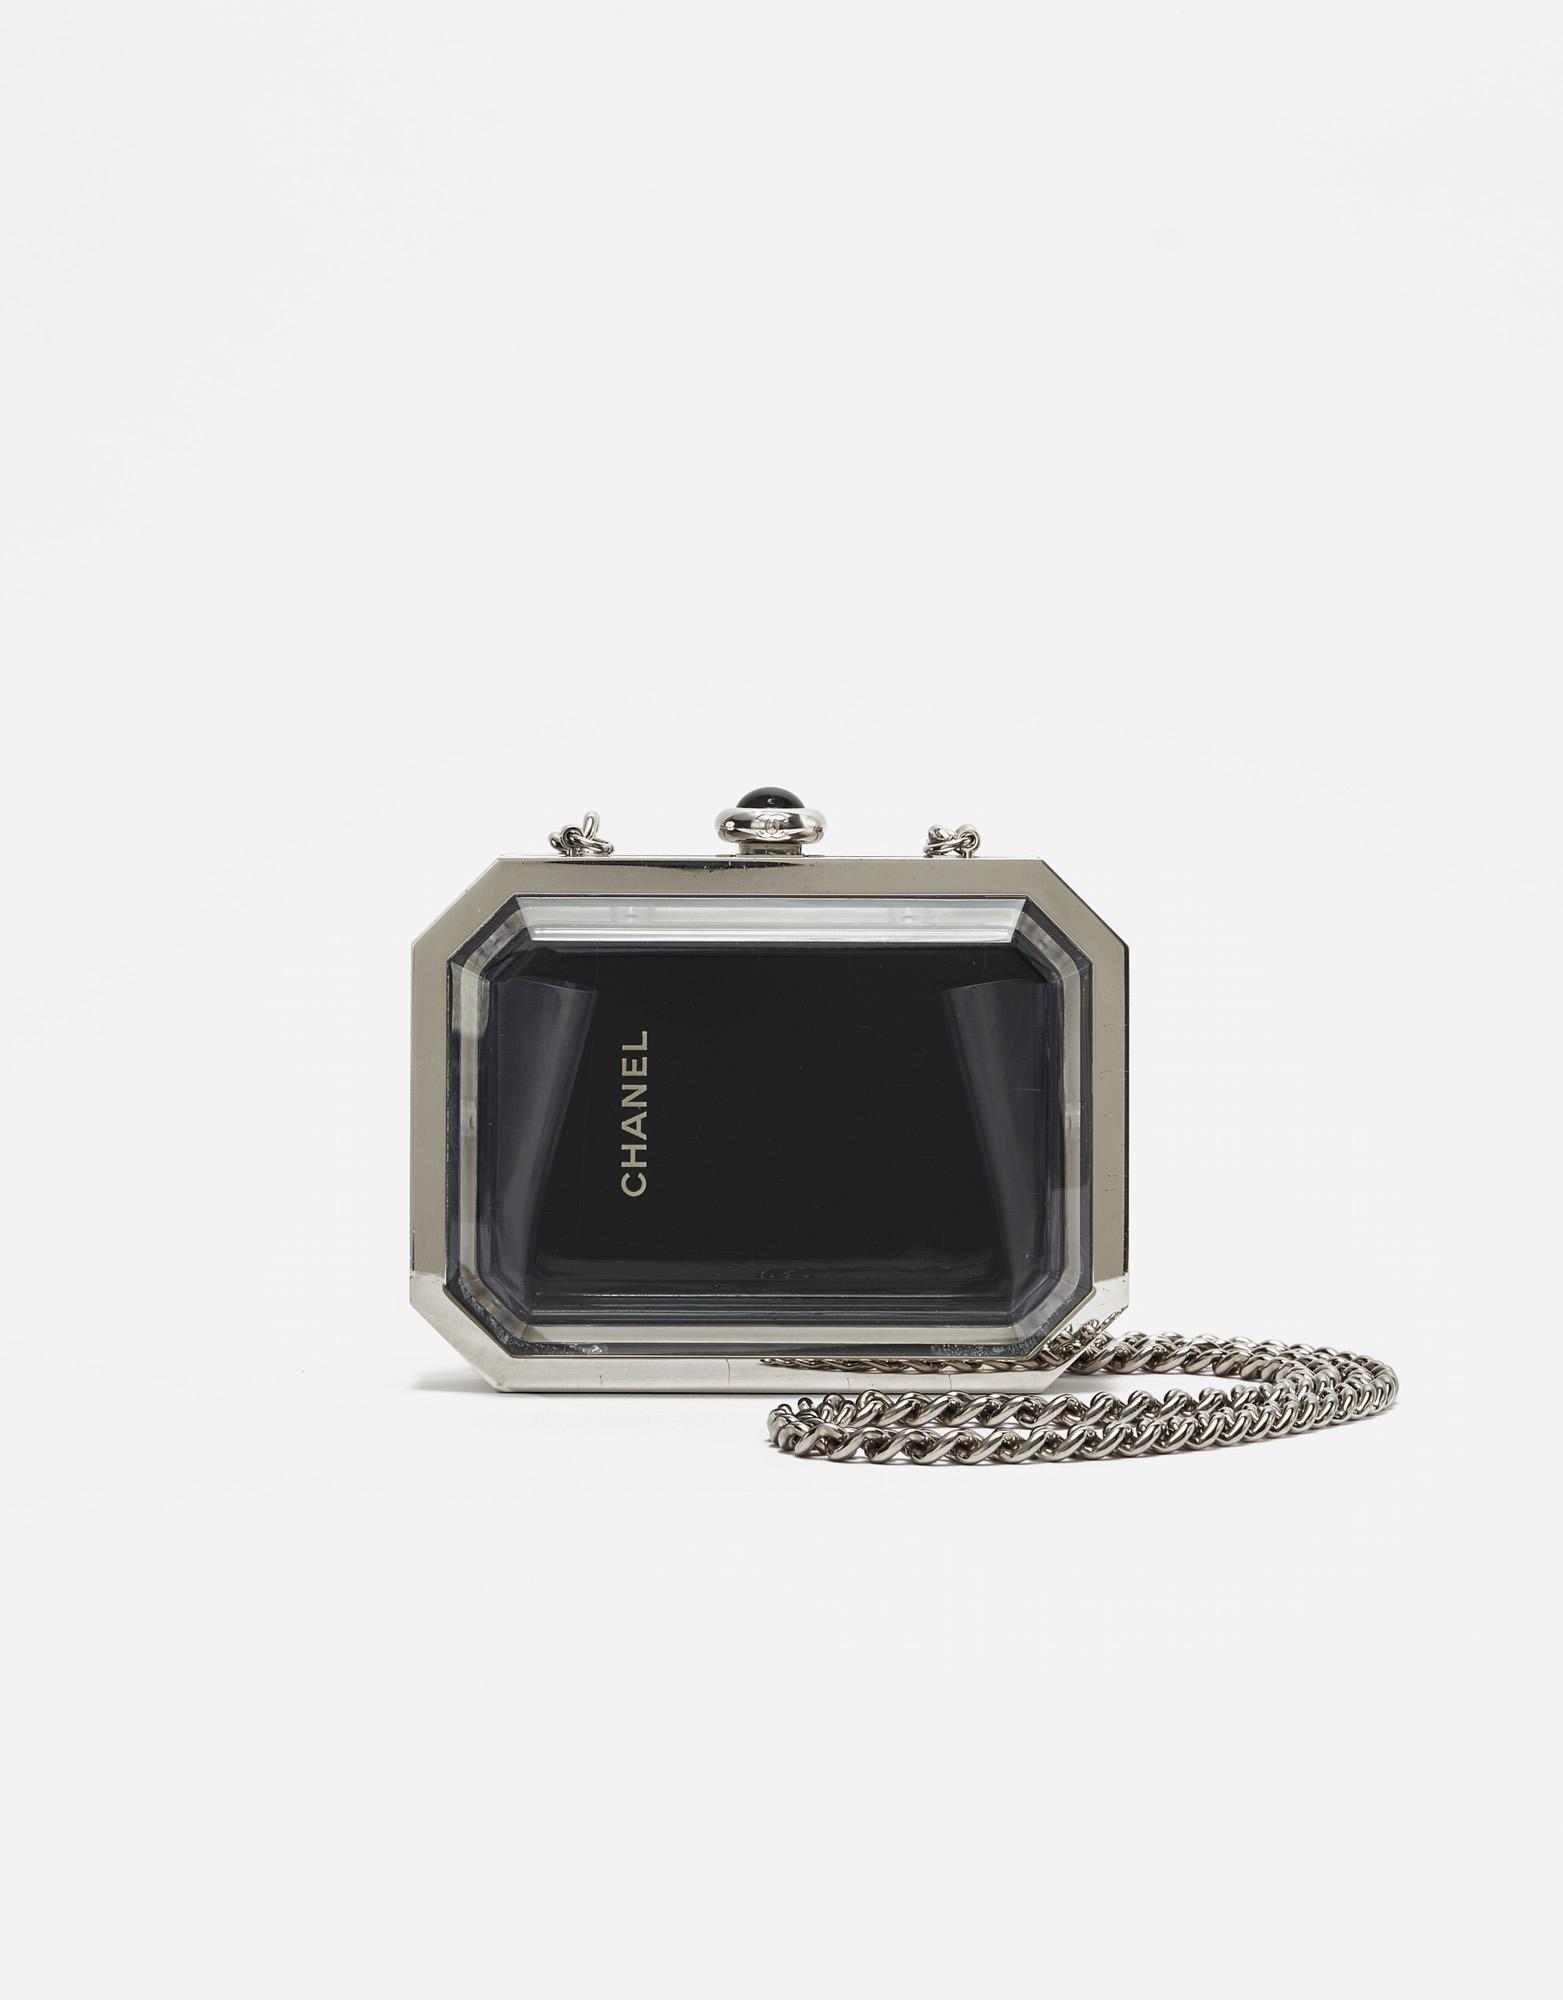 Chanel Première Minaudière Clutch Metal Plexiglass Black Silver